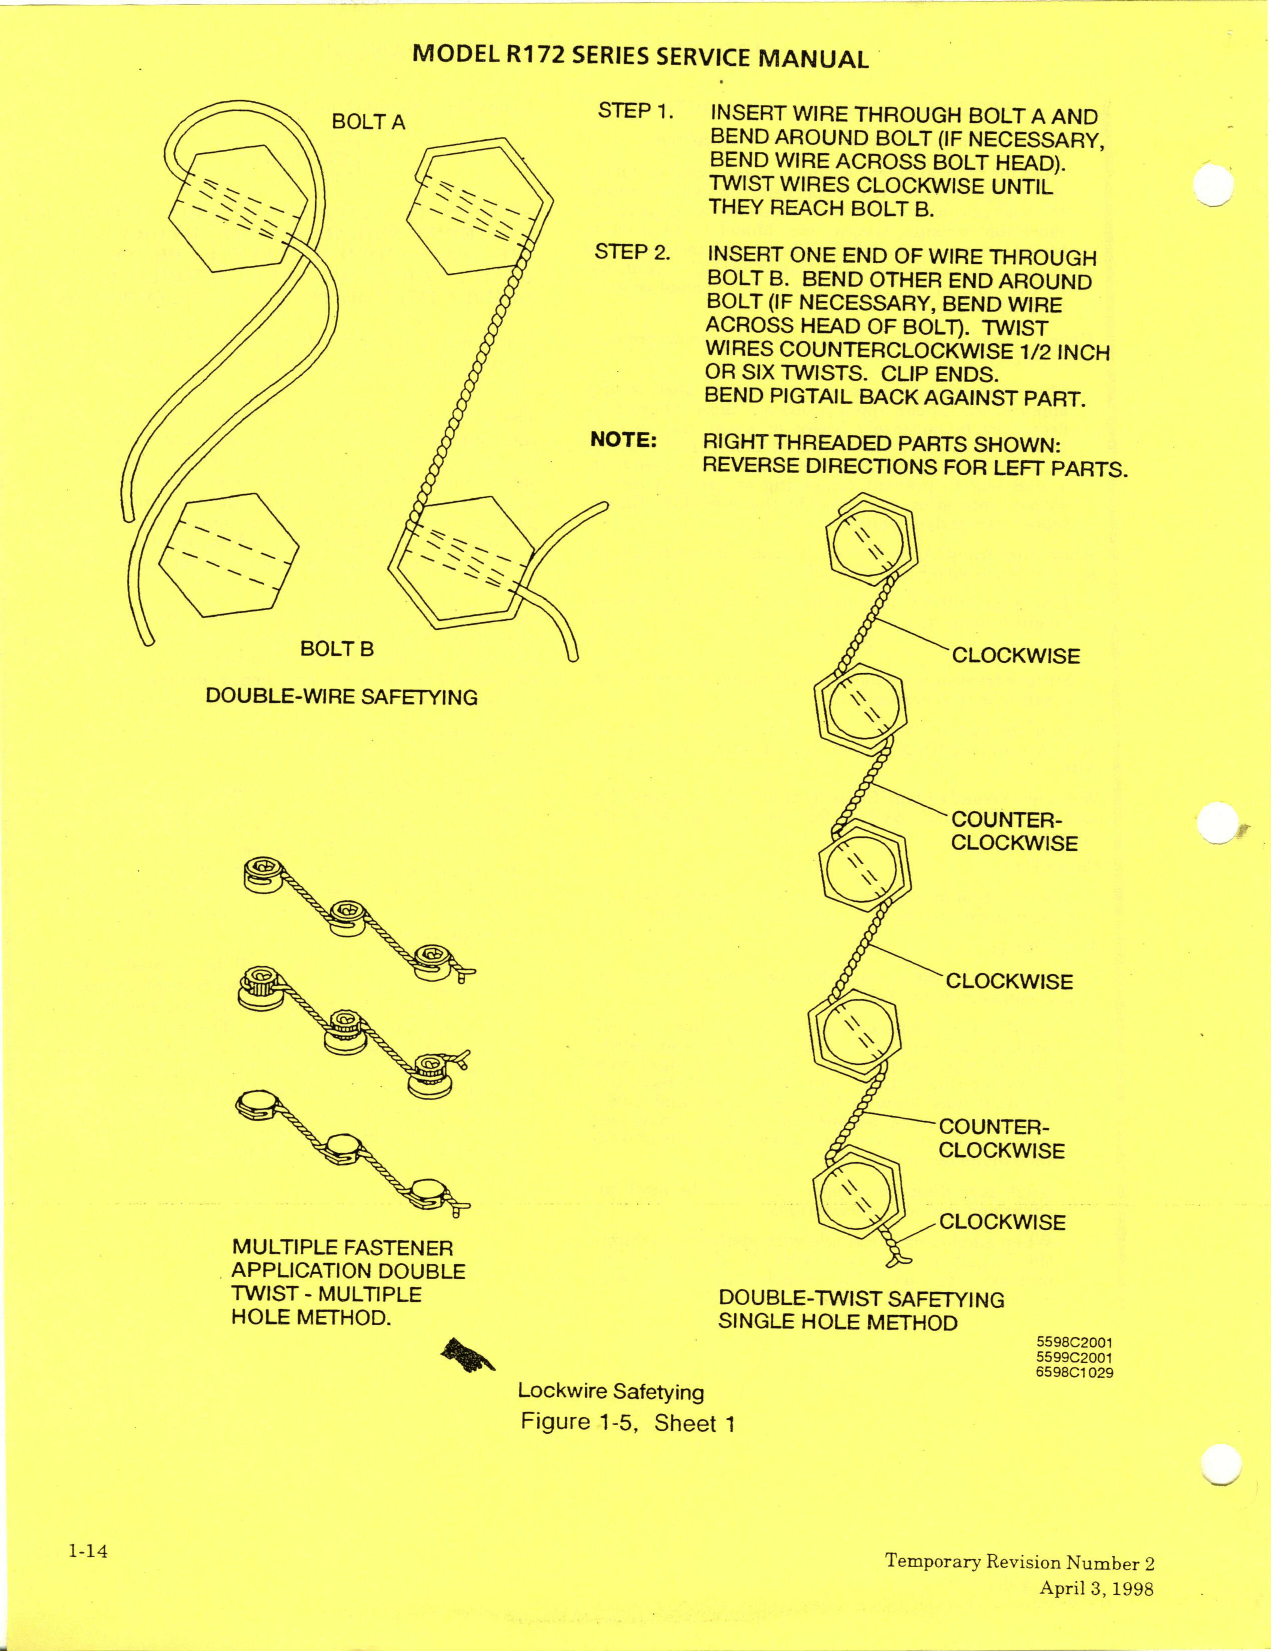 D2027 1 13 R172 Series 1977 Thru 1981